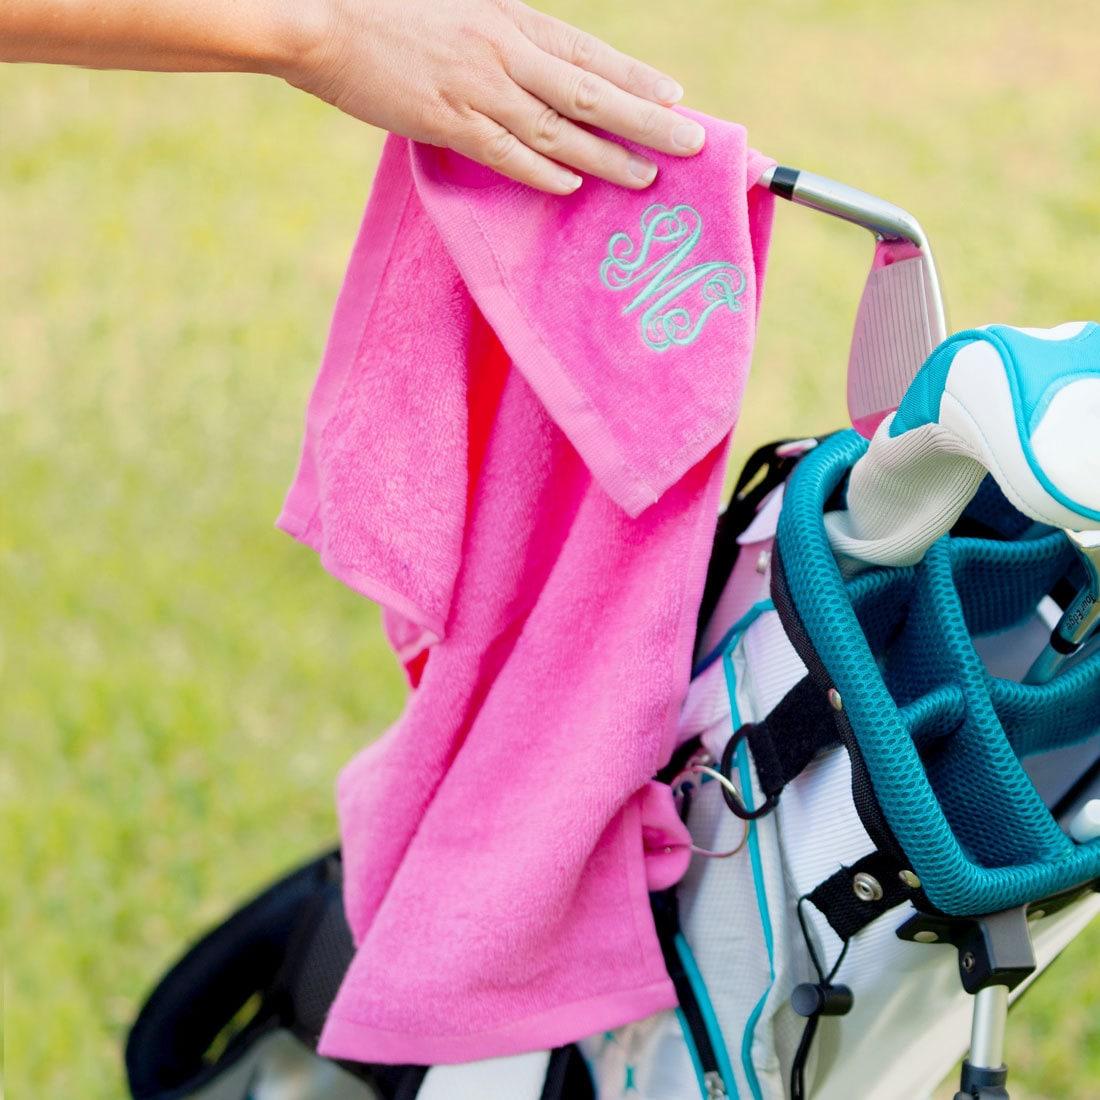 Hot Pink Golf Towel with Monogram Monogram Golf Towel Golf